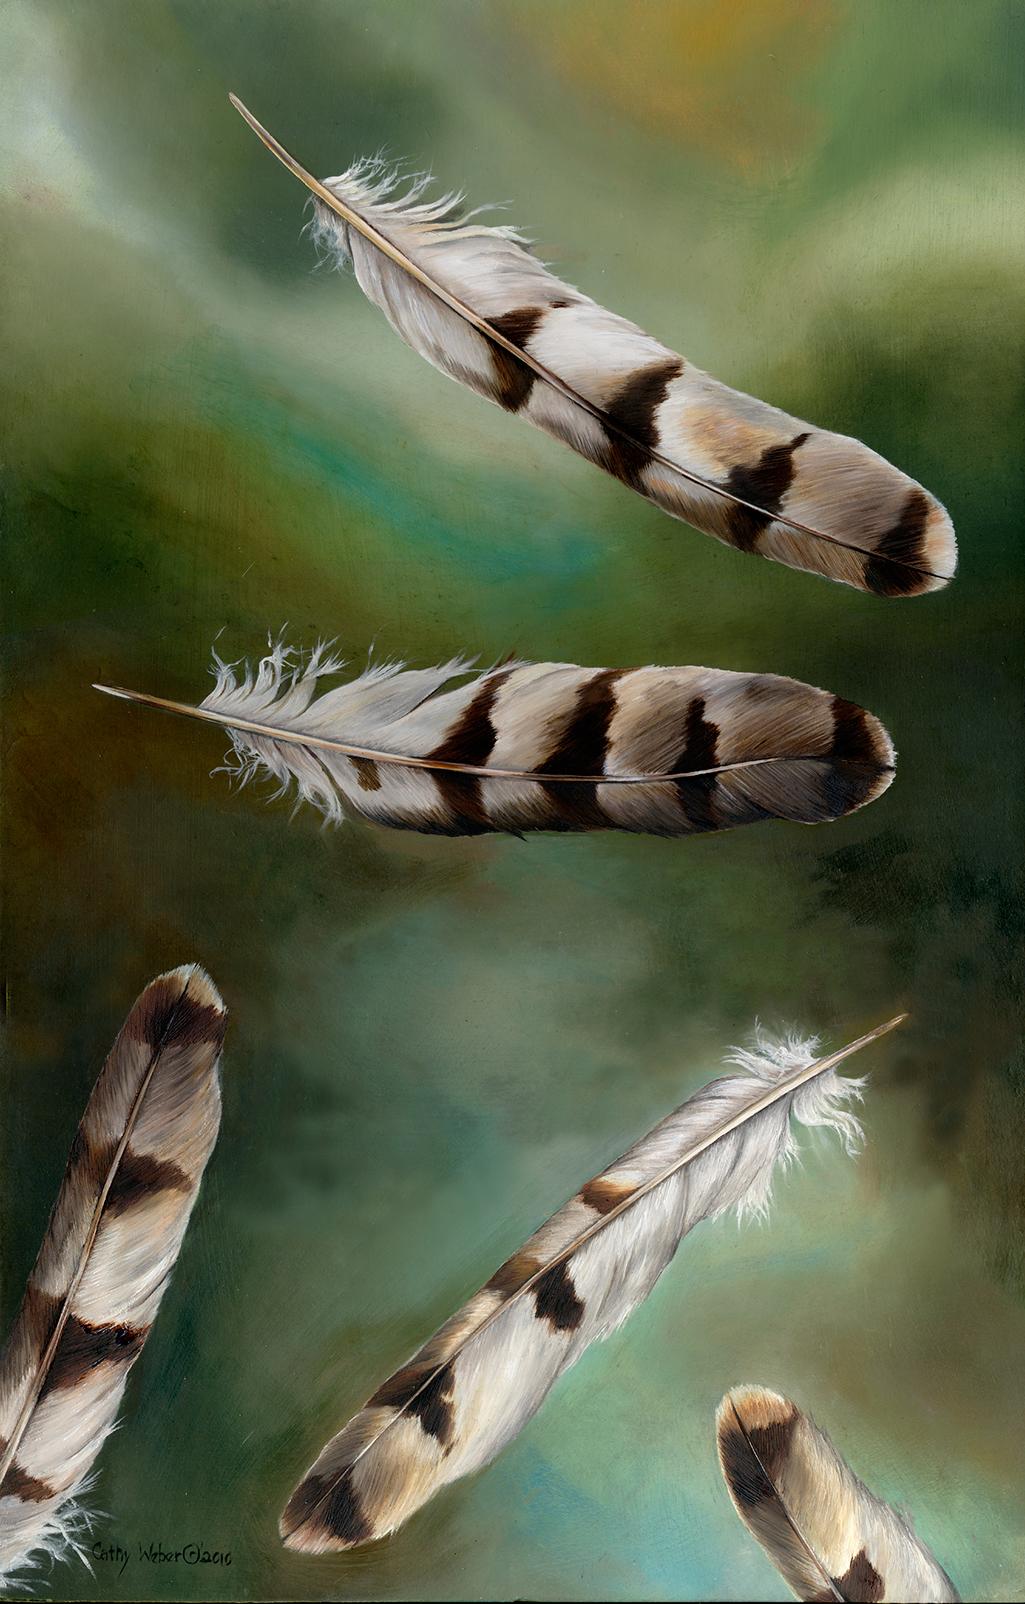 cathy weber - art - painting - woman - oil - montana - oil - object